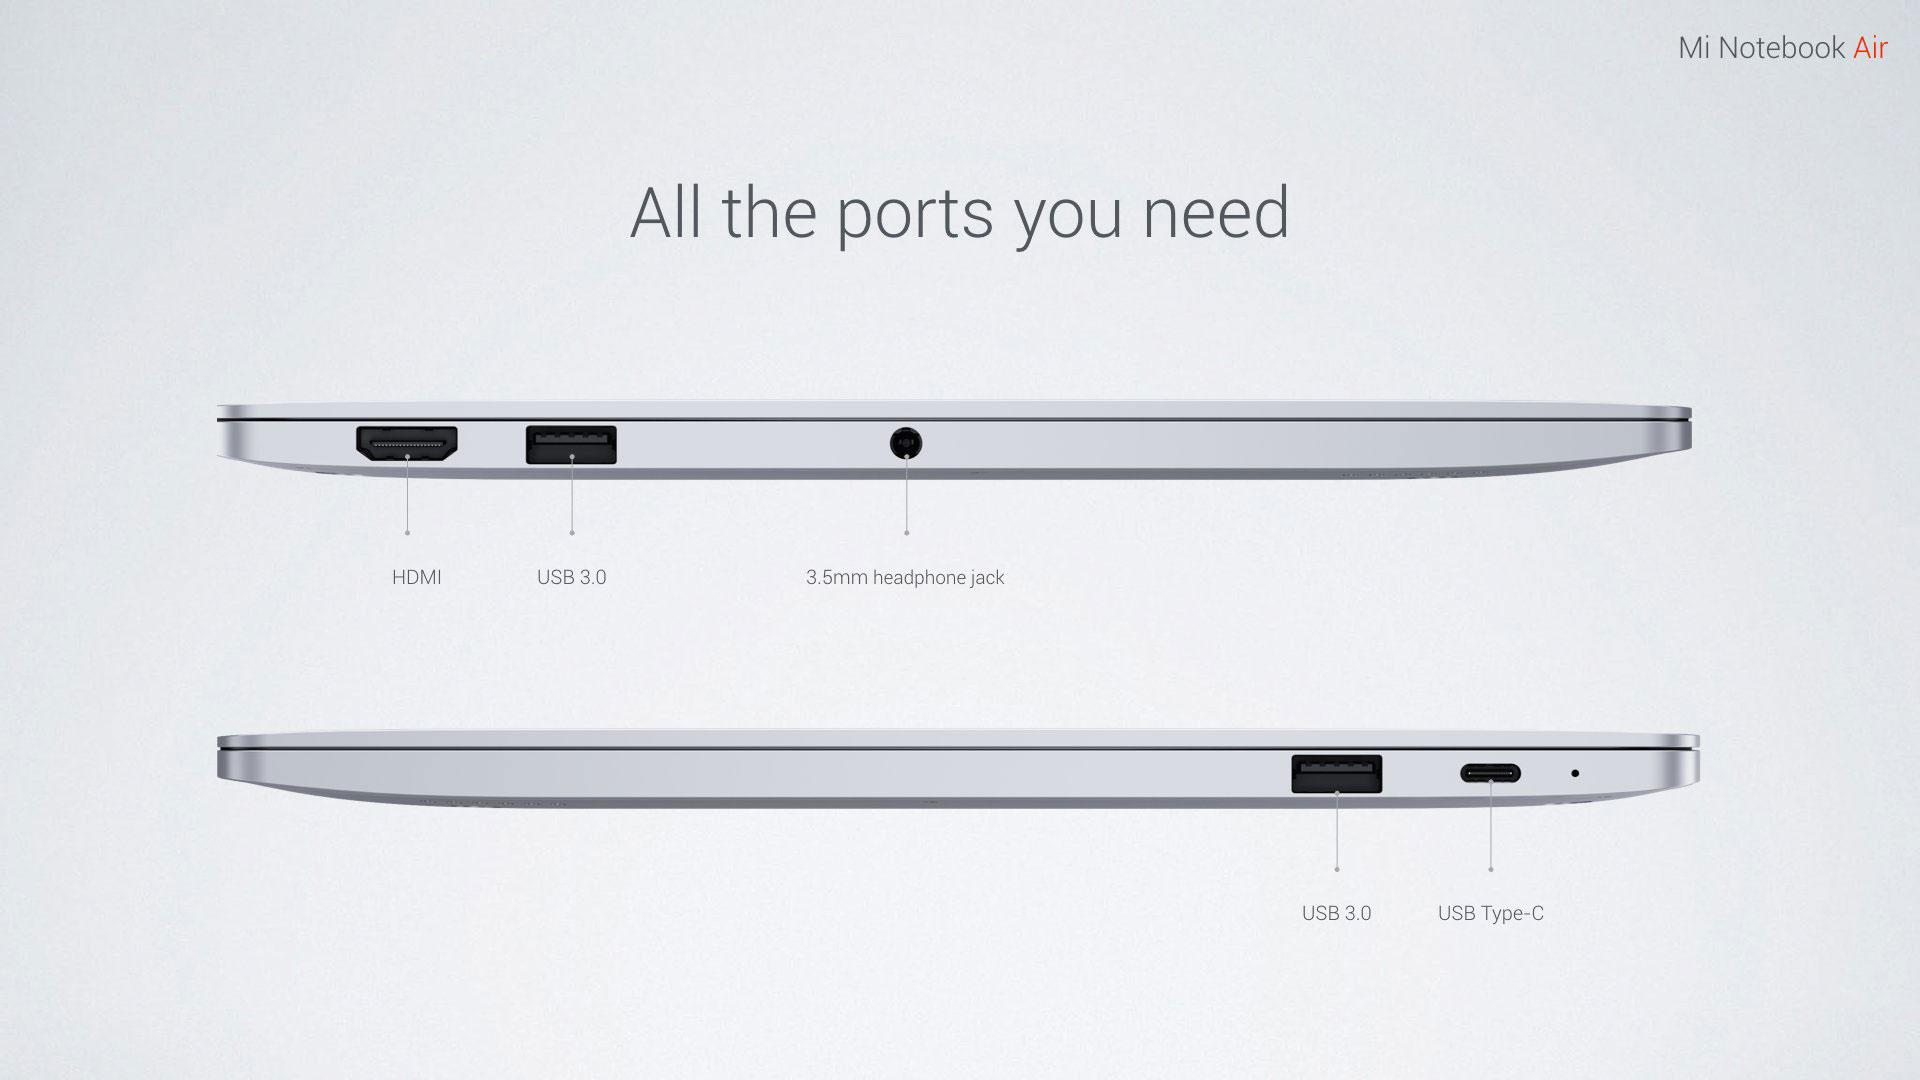 xiaomi-Mi-Notebook-Air-puertos